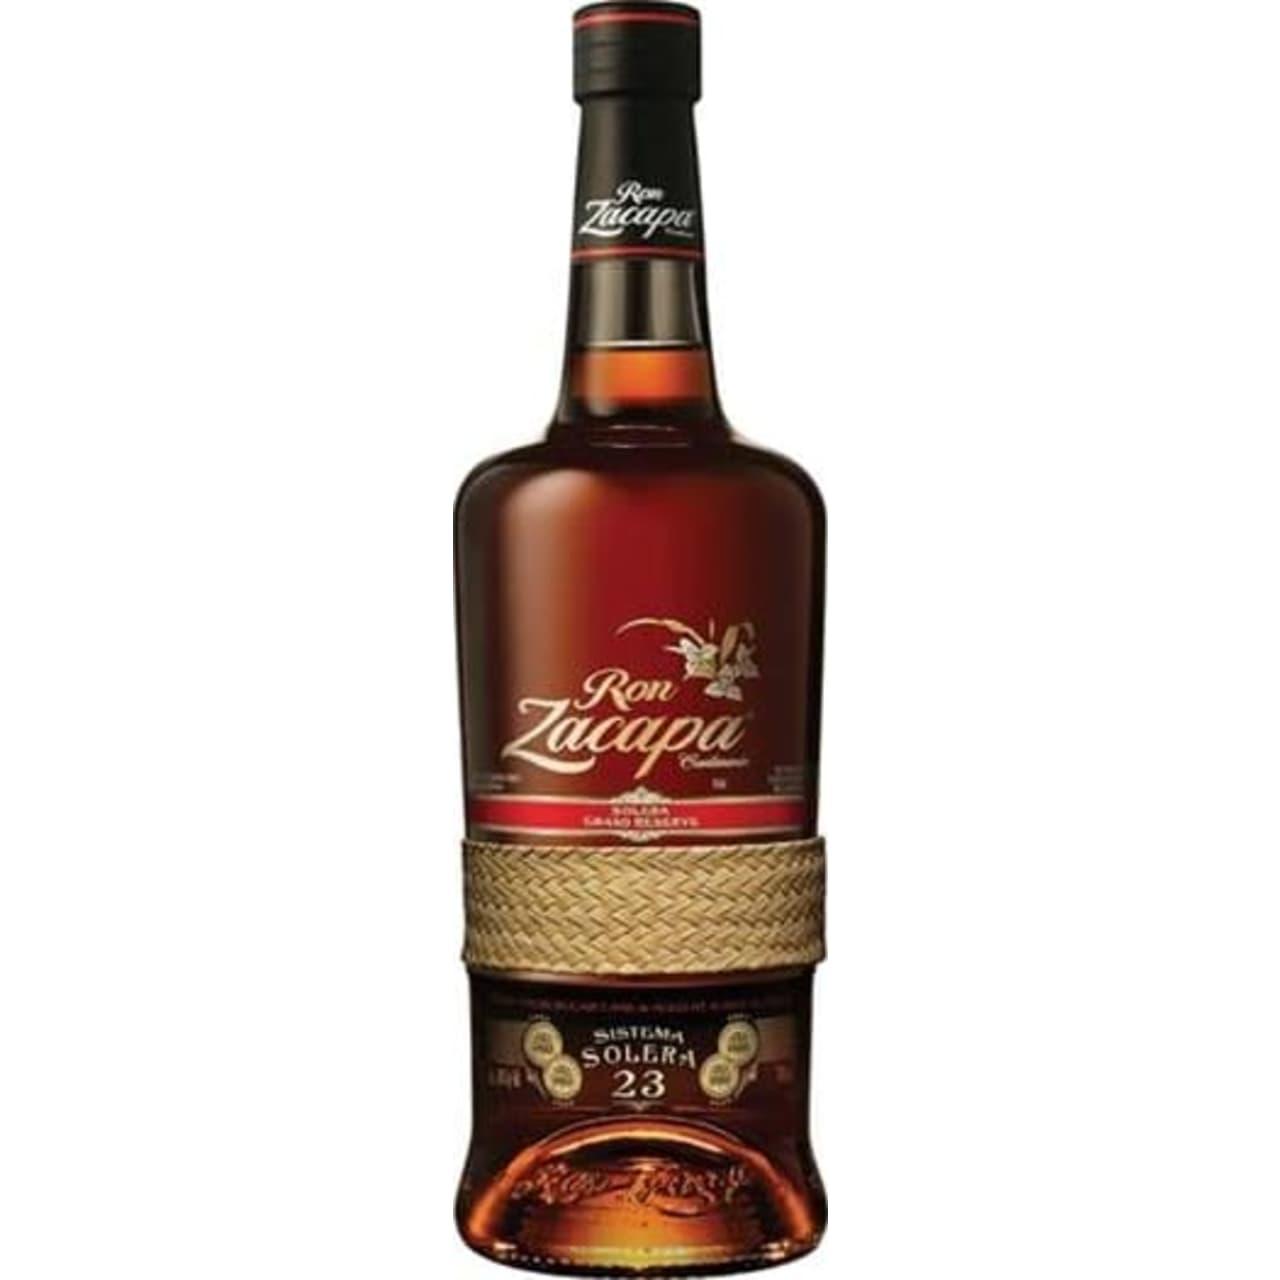 Product Image - Ron Zacapa Centenario Sistema Solera 23 Rum